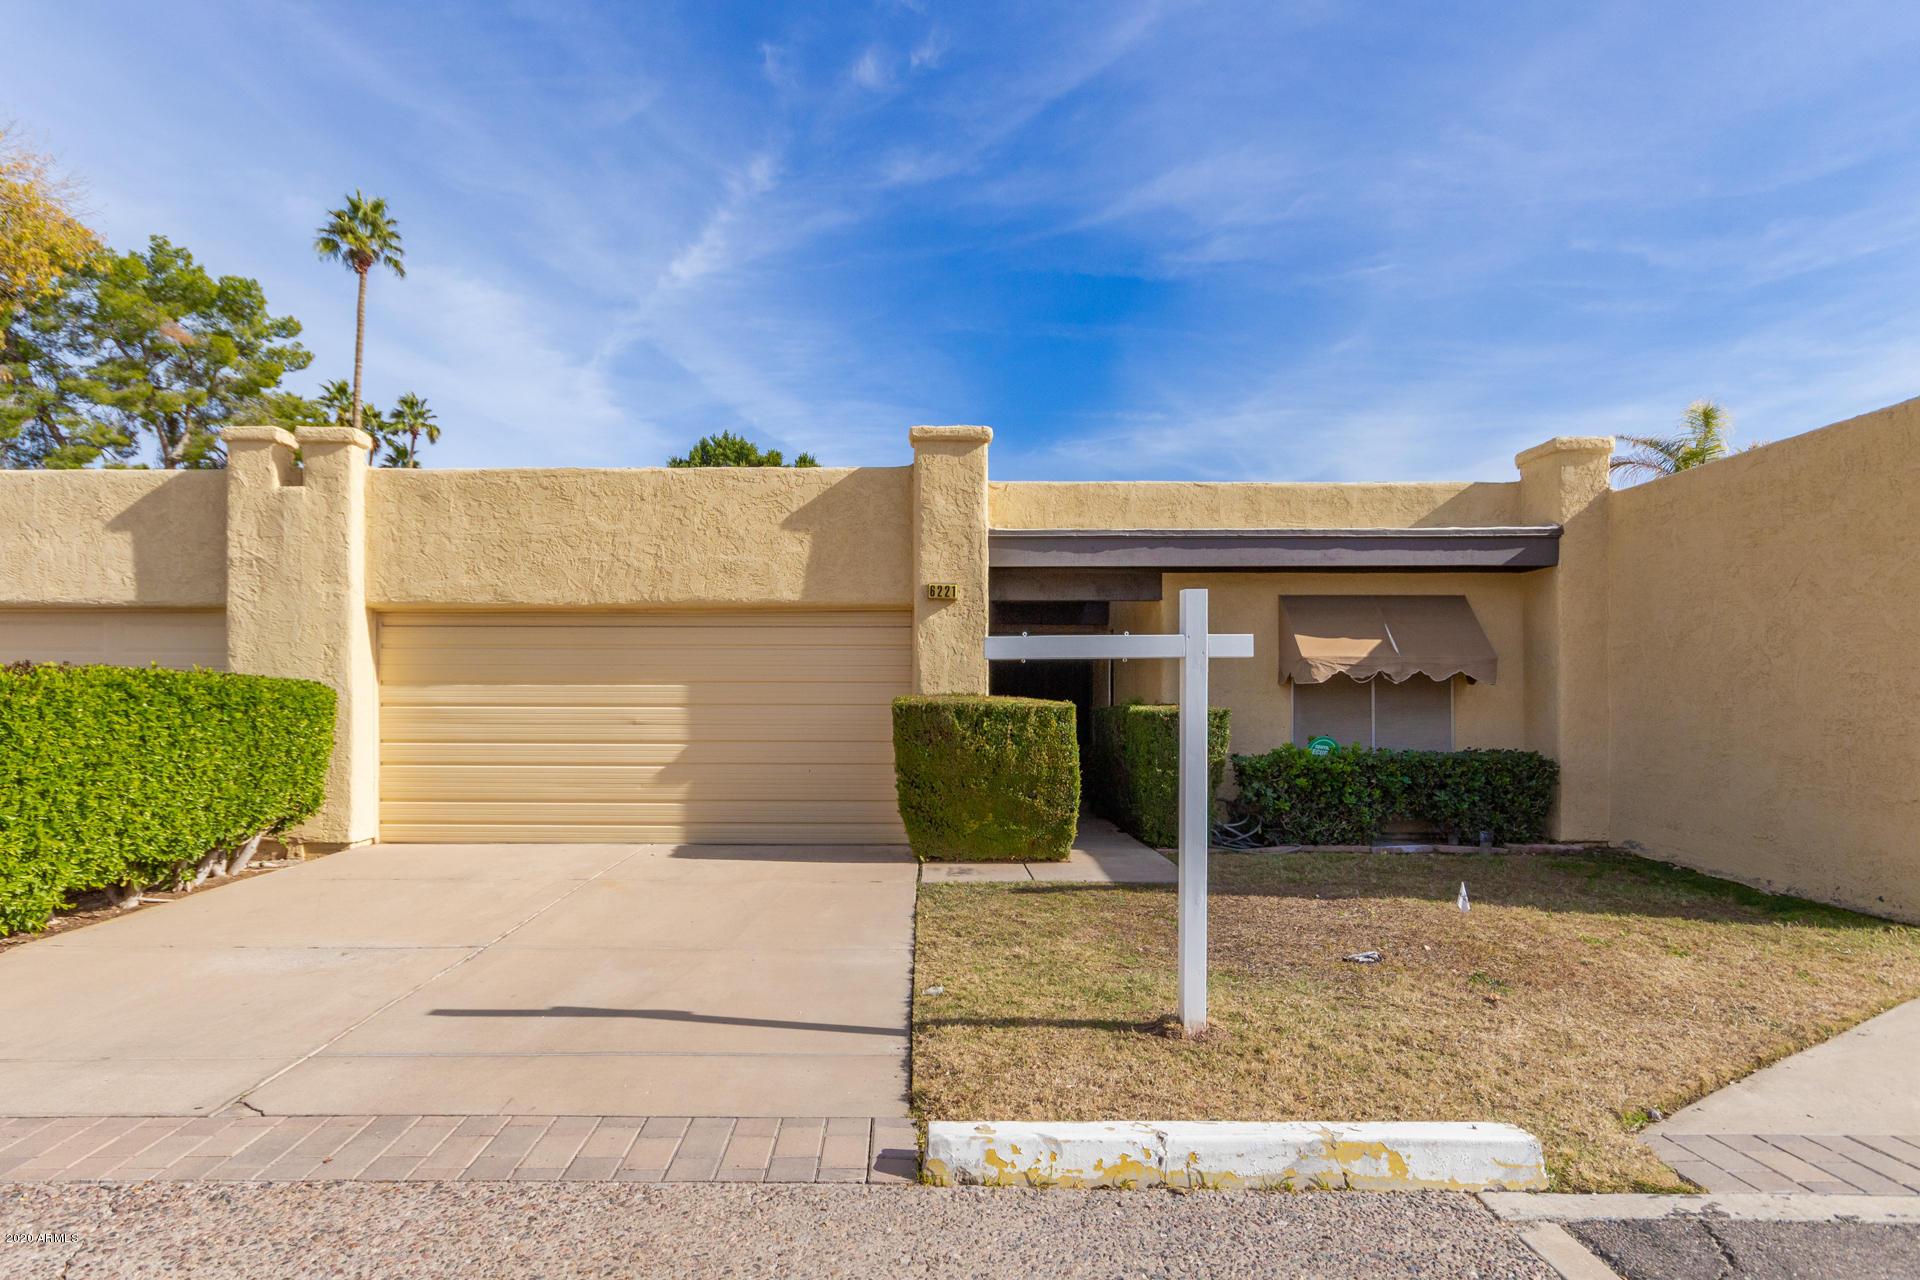 Photo of 6221 N 22ND Drive, Phoenix, AZ 85015